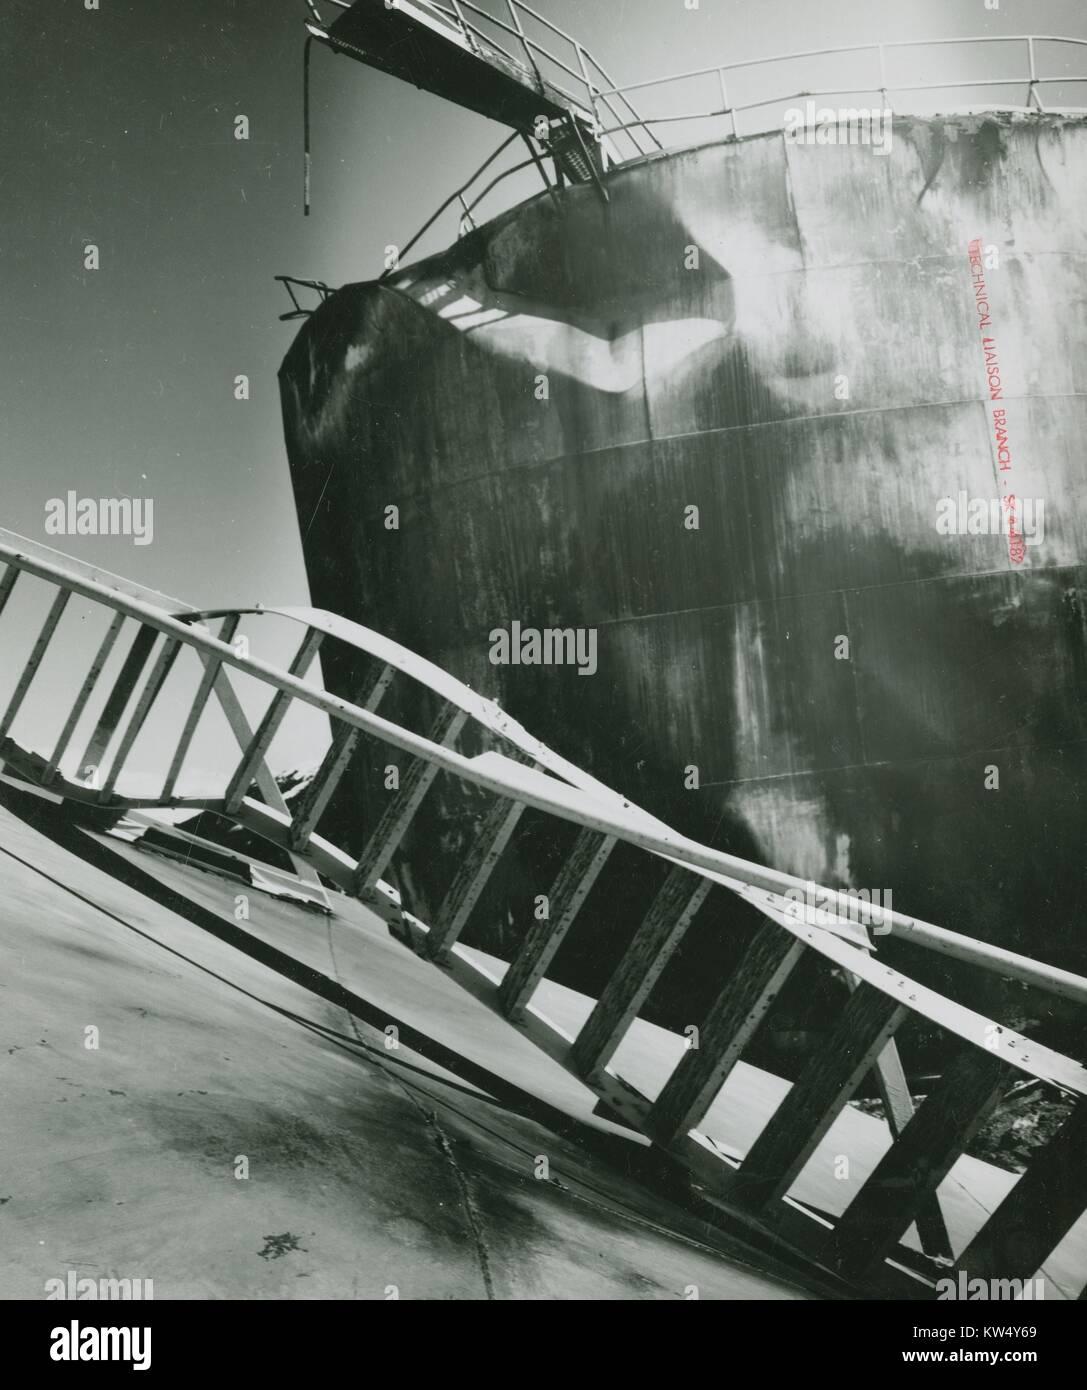 Damaged bulk tanks in Whittier, Alaska, 1964. - Stock Image